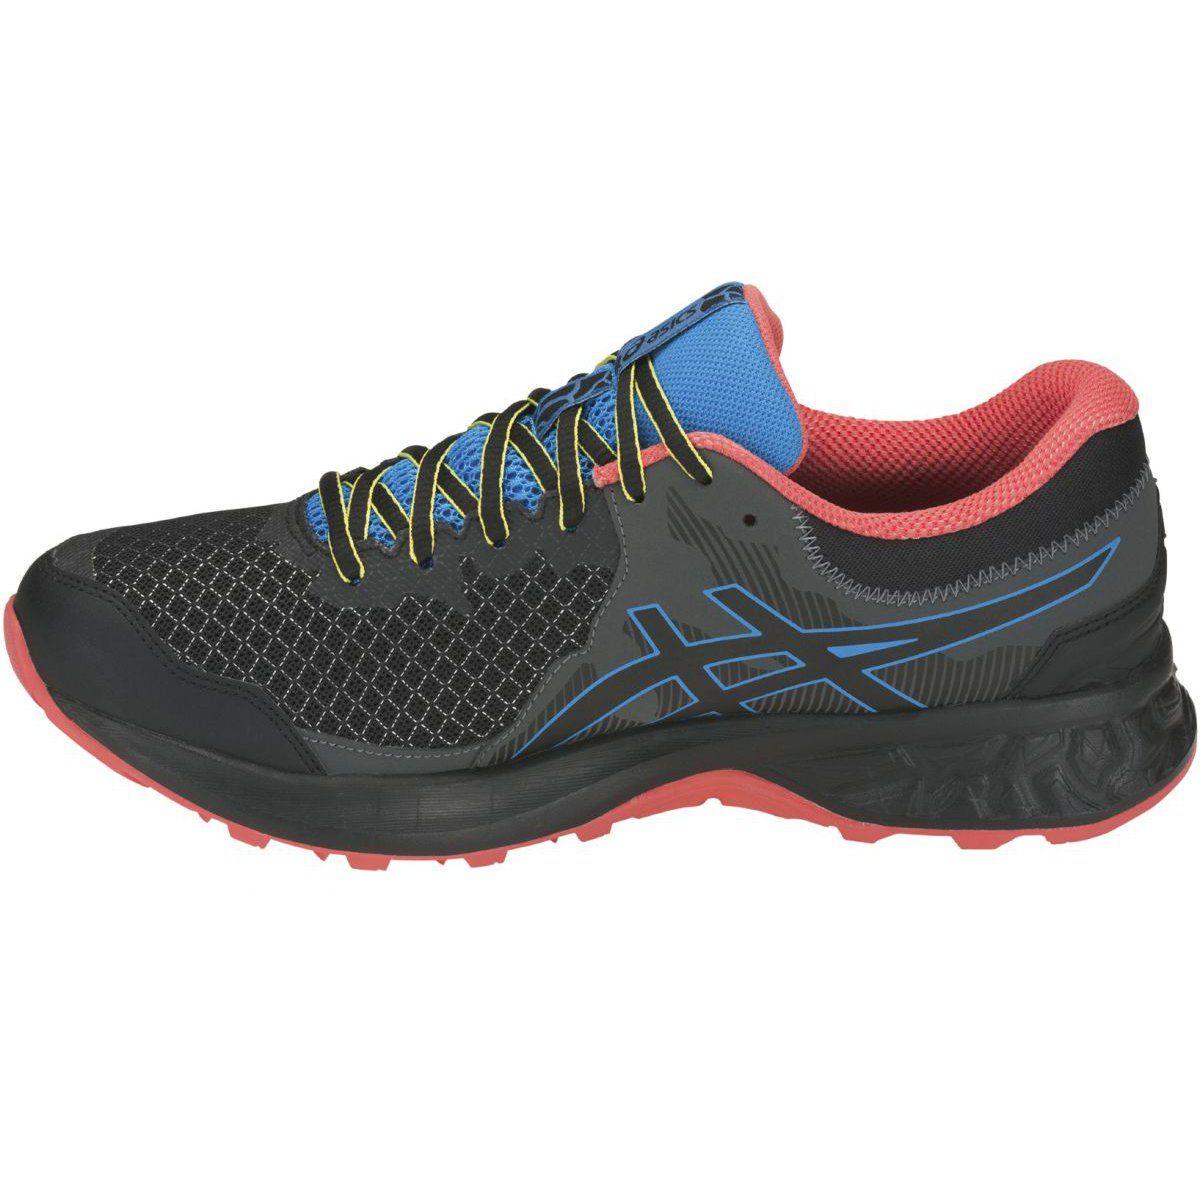 Terenowe Bieganie Sport Asics Buty Asics Gel Sonoma 4 M 1011a177 001 Asics Asics Gel Brooks Sneaker